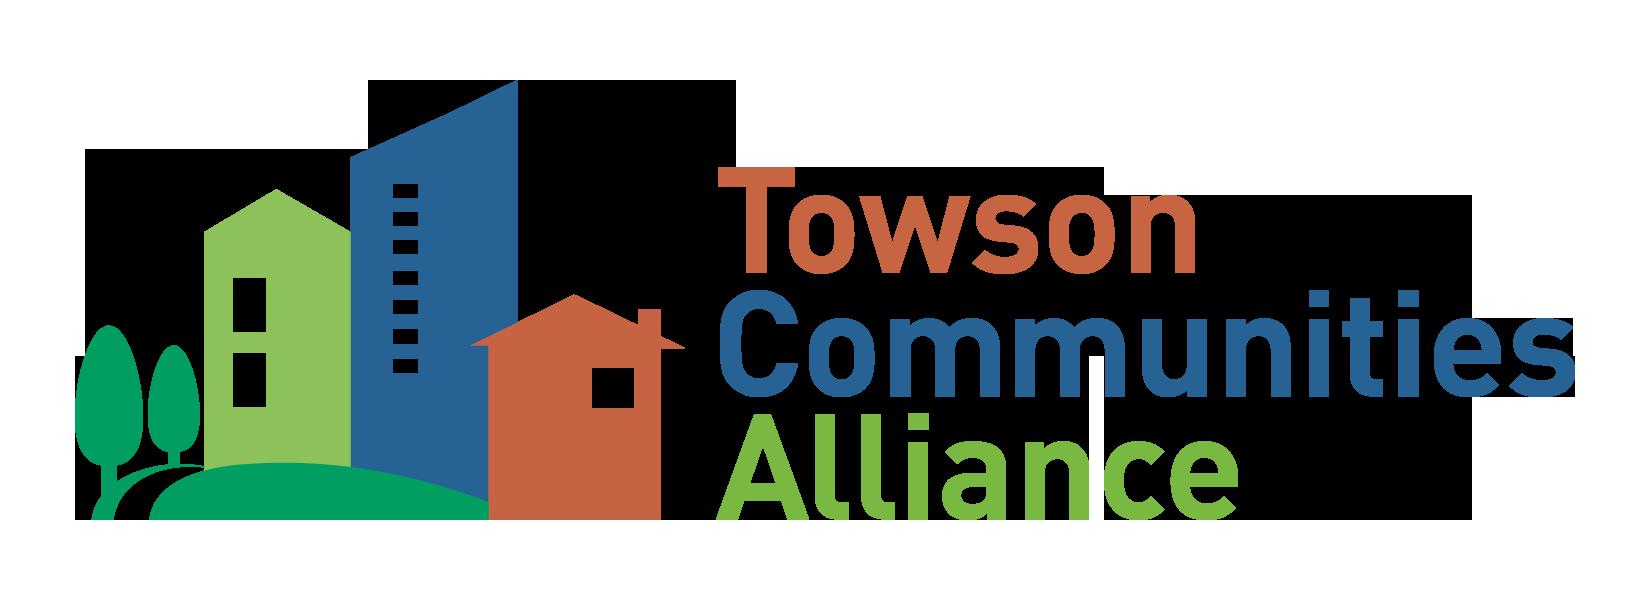 Towson Communities Alliance